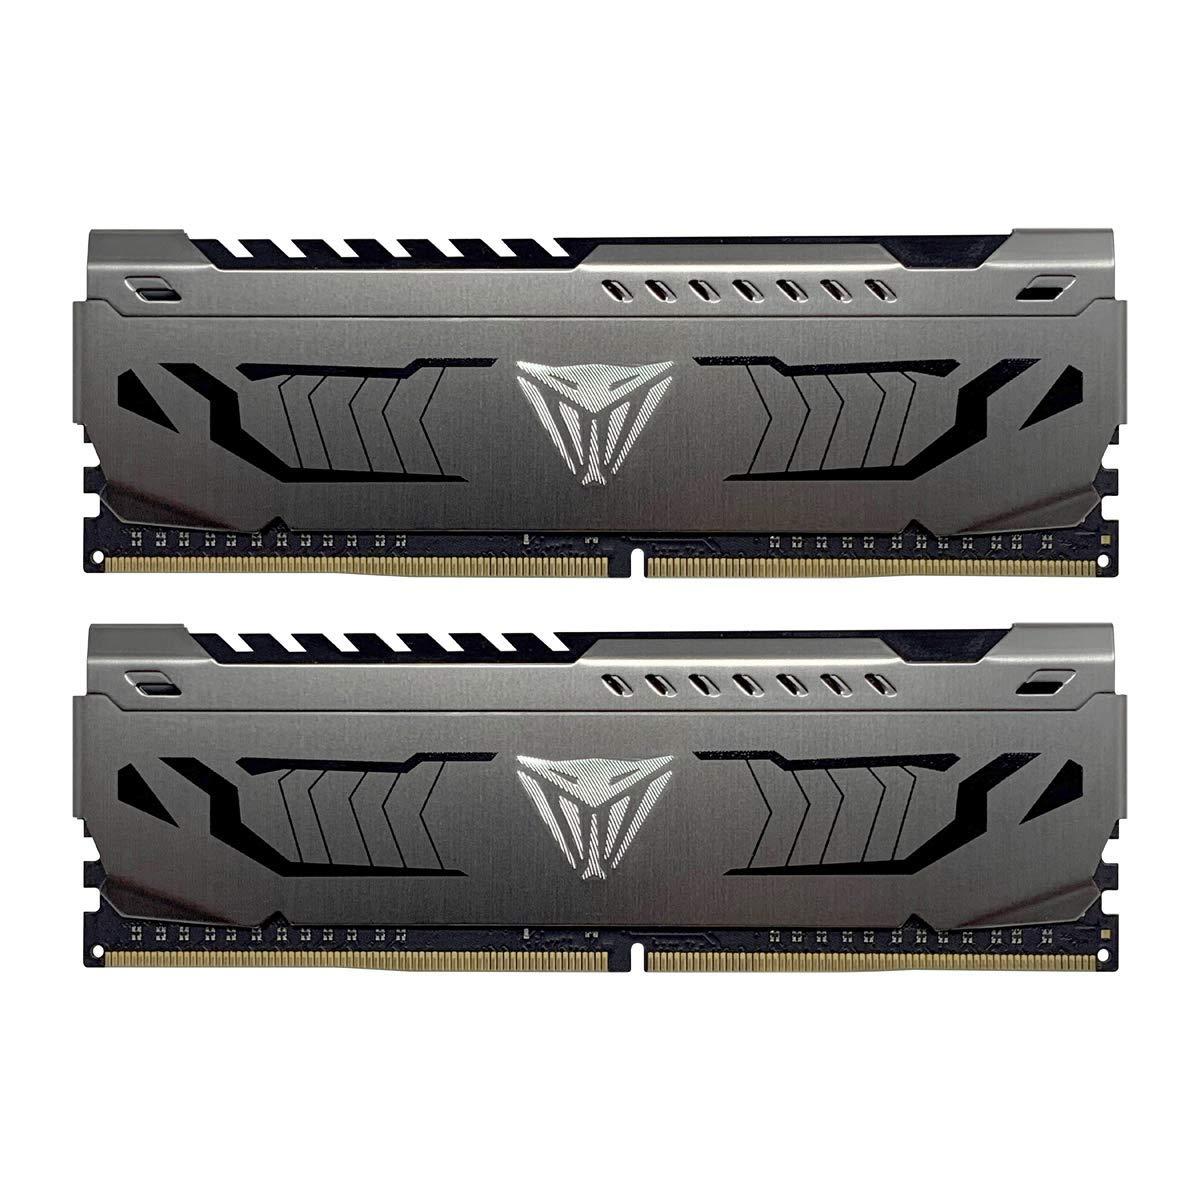 Patriot Viper Steel 32GB (2x16GB) DDR4 C16 3200MHz Memory Kit £109.95 at Amazon